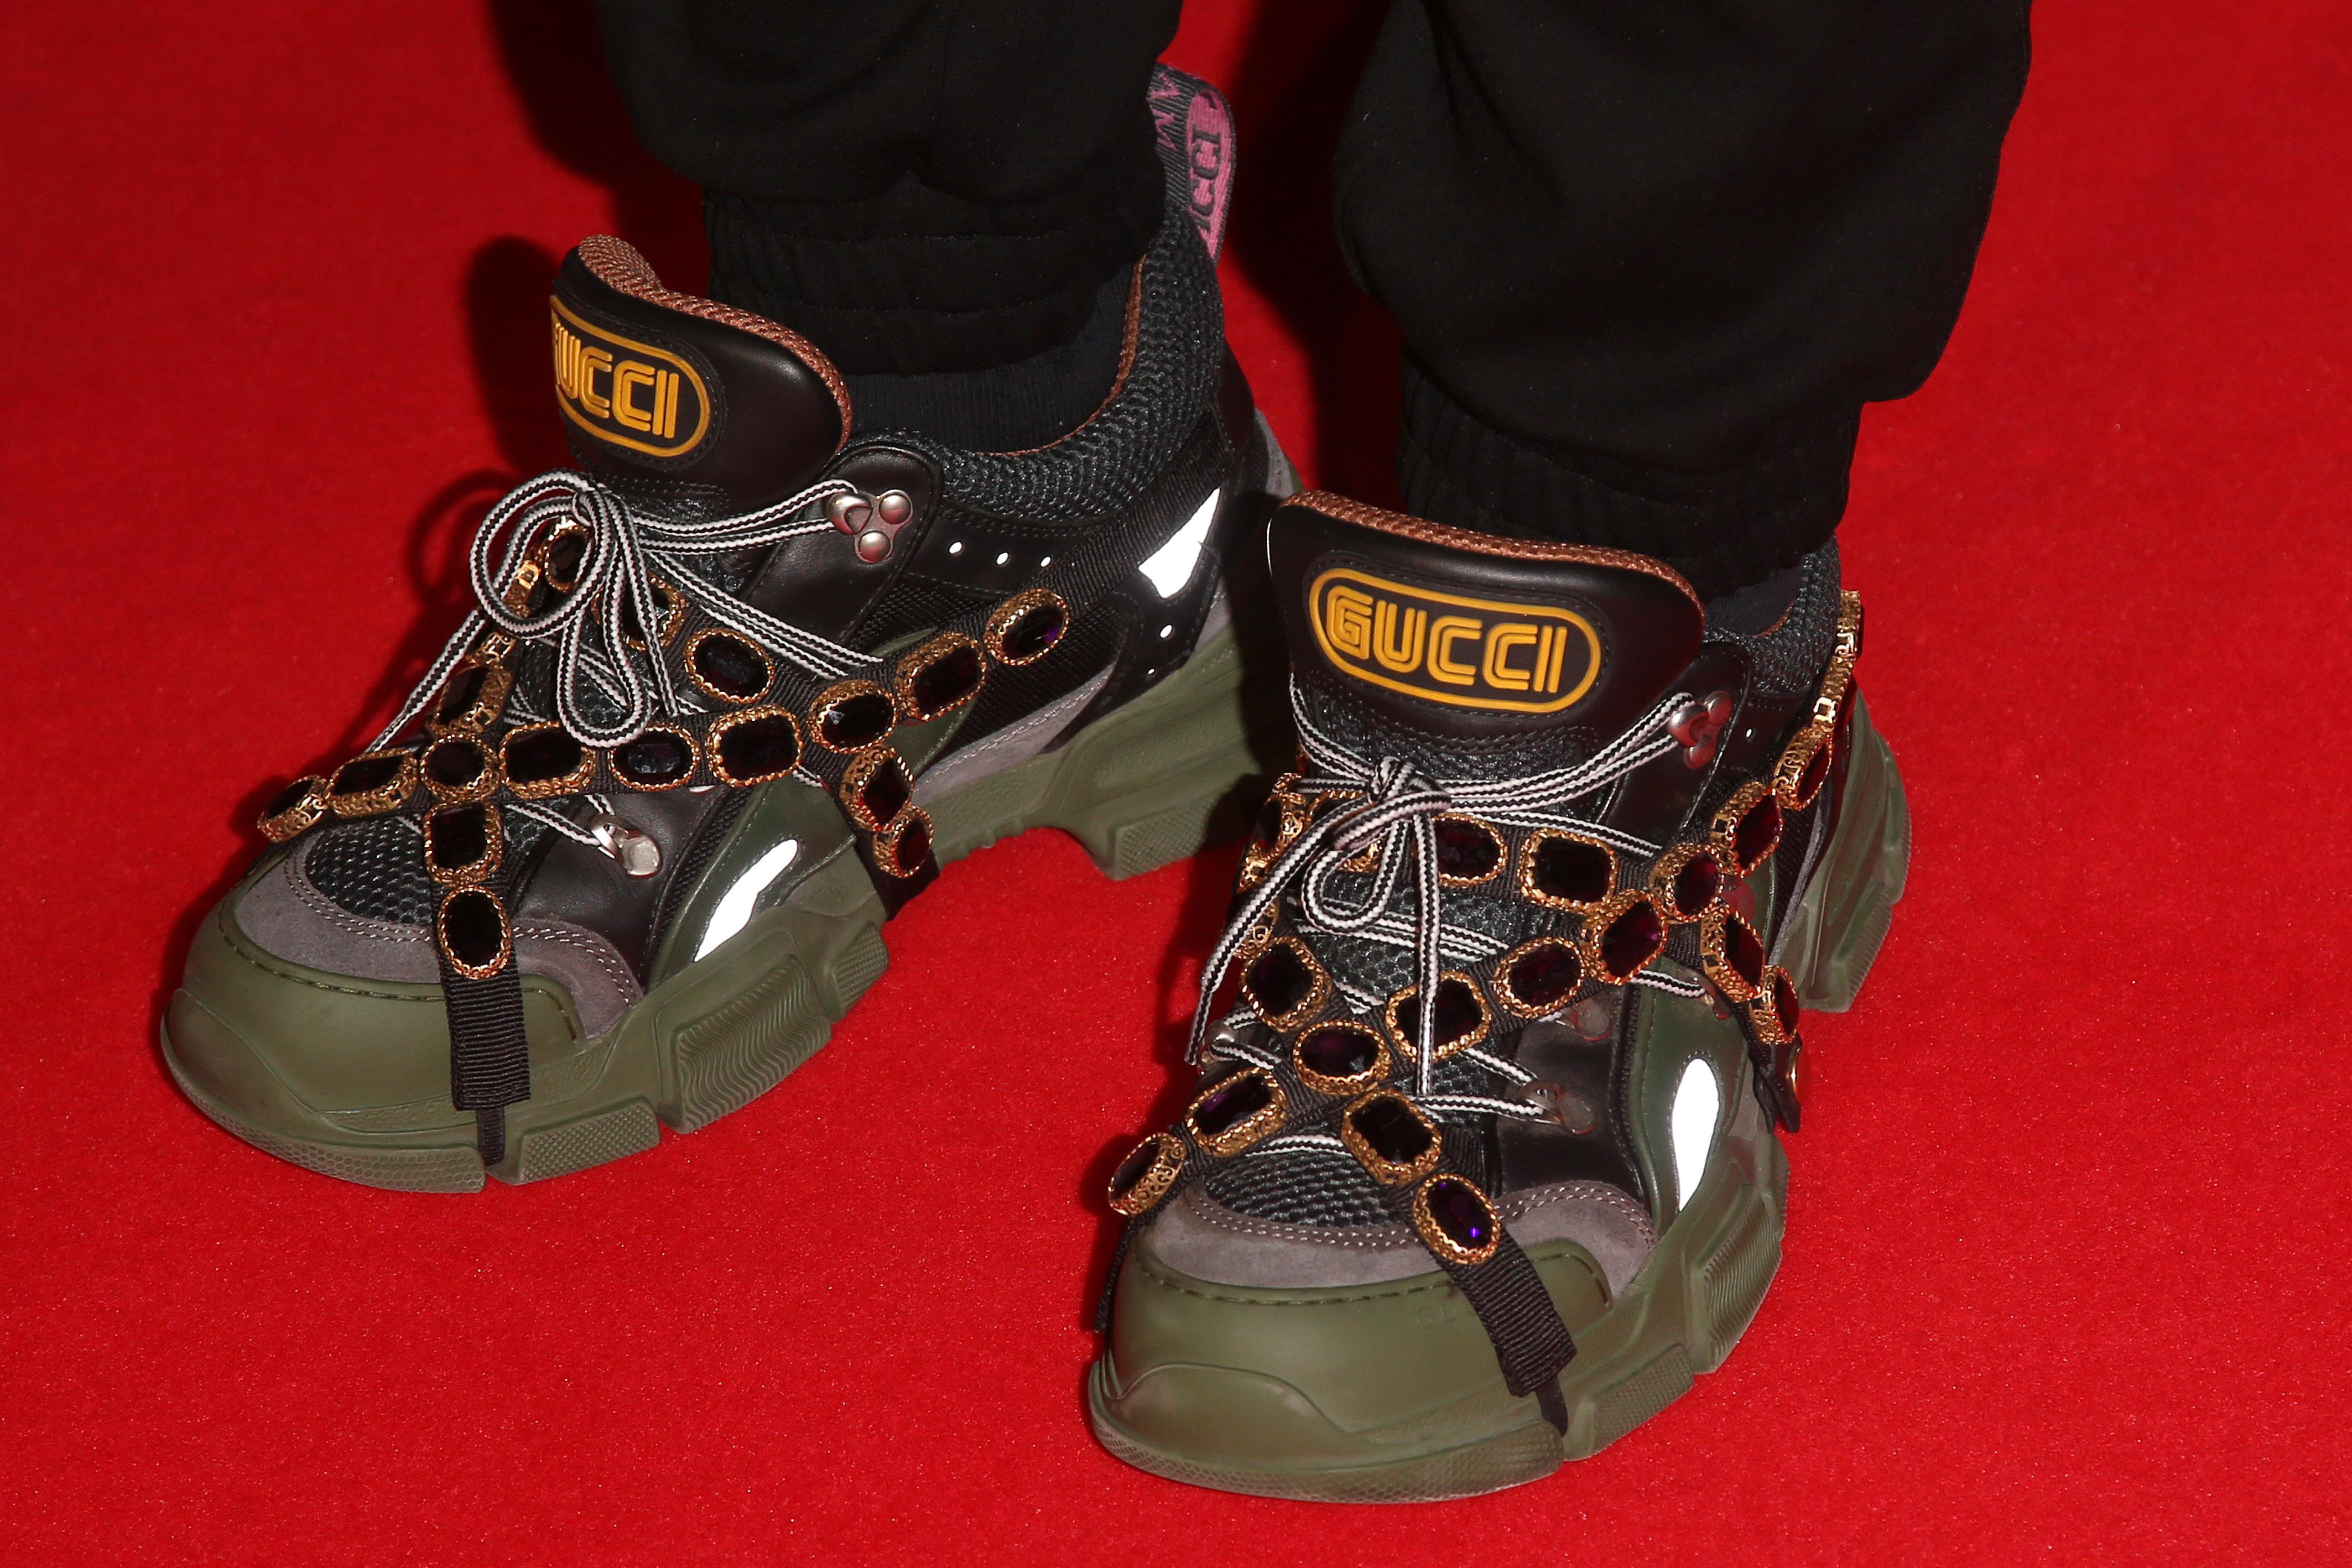 Patryk Vega W Butach Gucci Za Ponad 1000 Euro